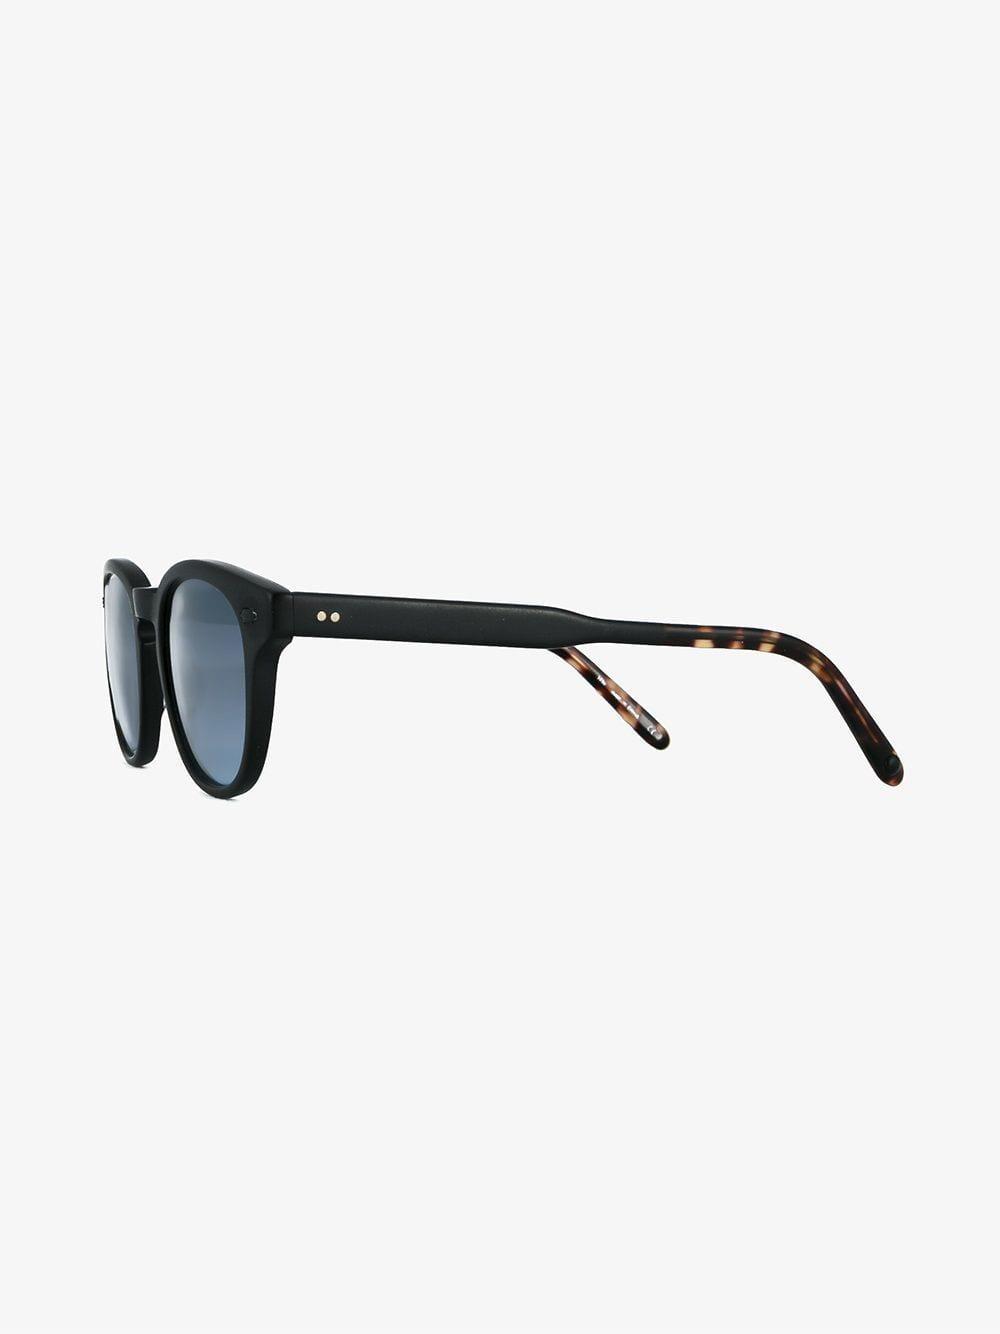 d6d23ee09873 Lyst - Garrett Leight Warren Sunglasses in Black for Men